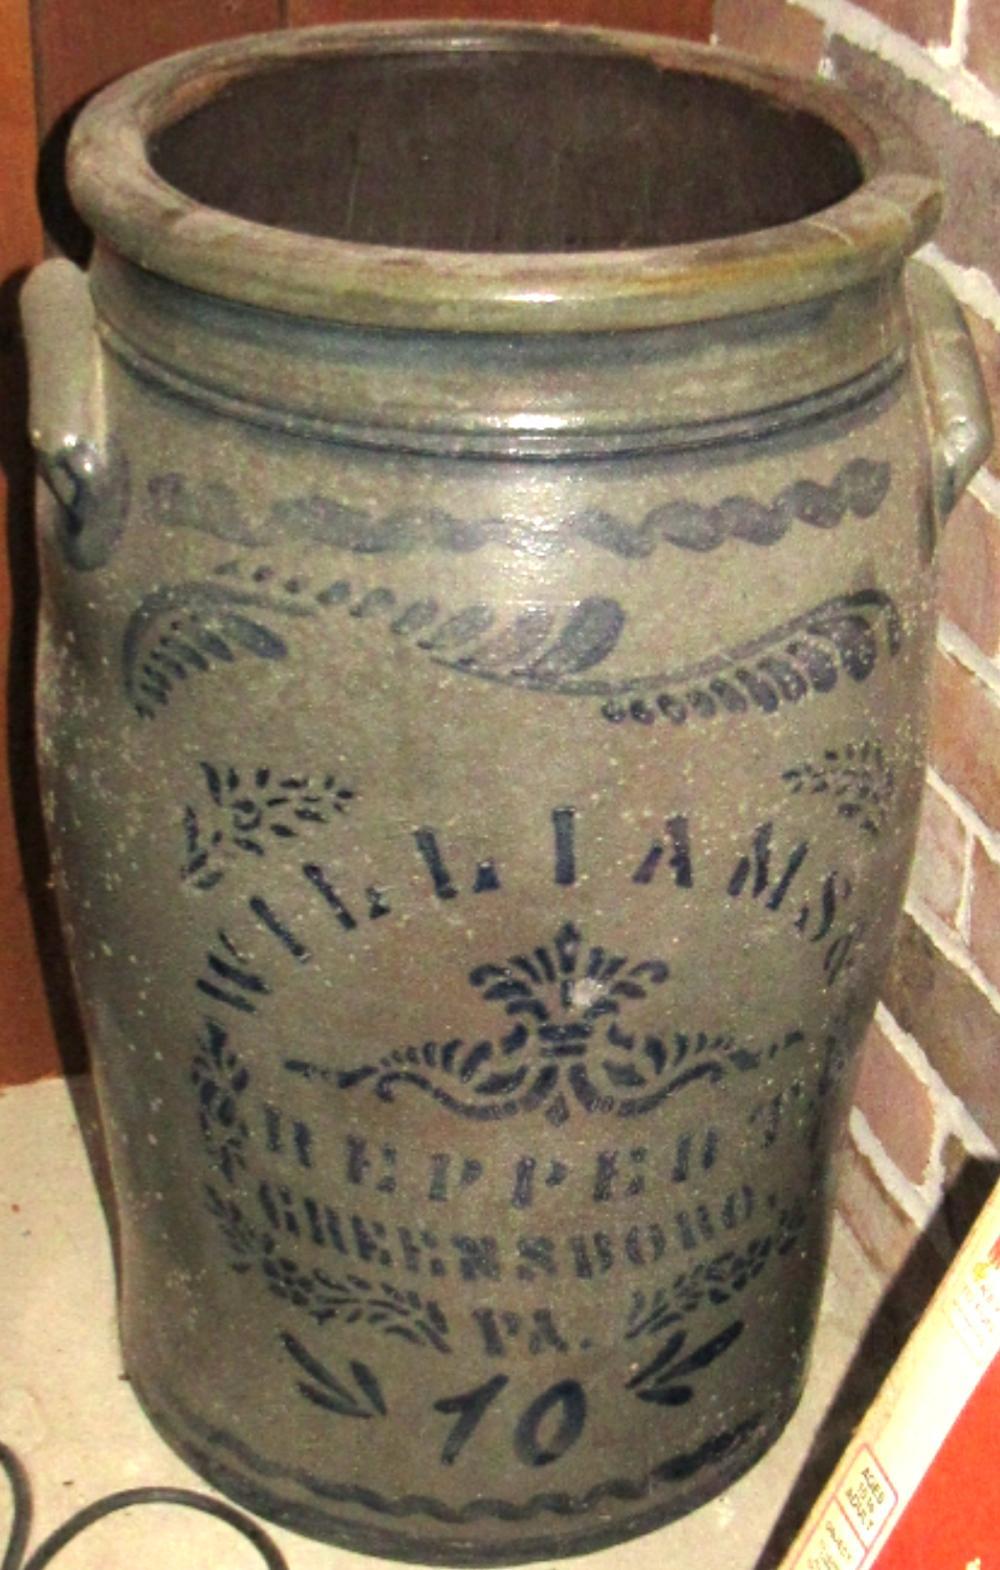 RARE Antique Cobalt Blue Williams & Reppert Greensboro, PA Stoneware 10 gallon Crock, EC